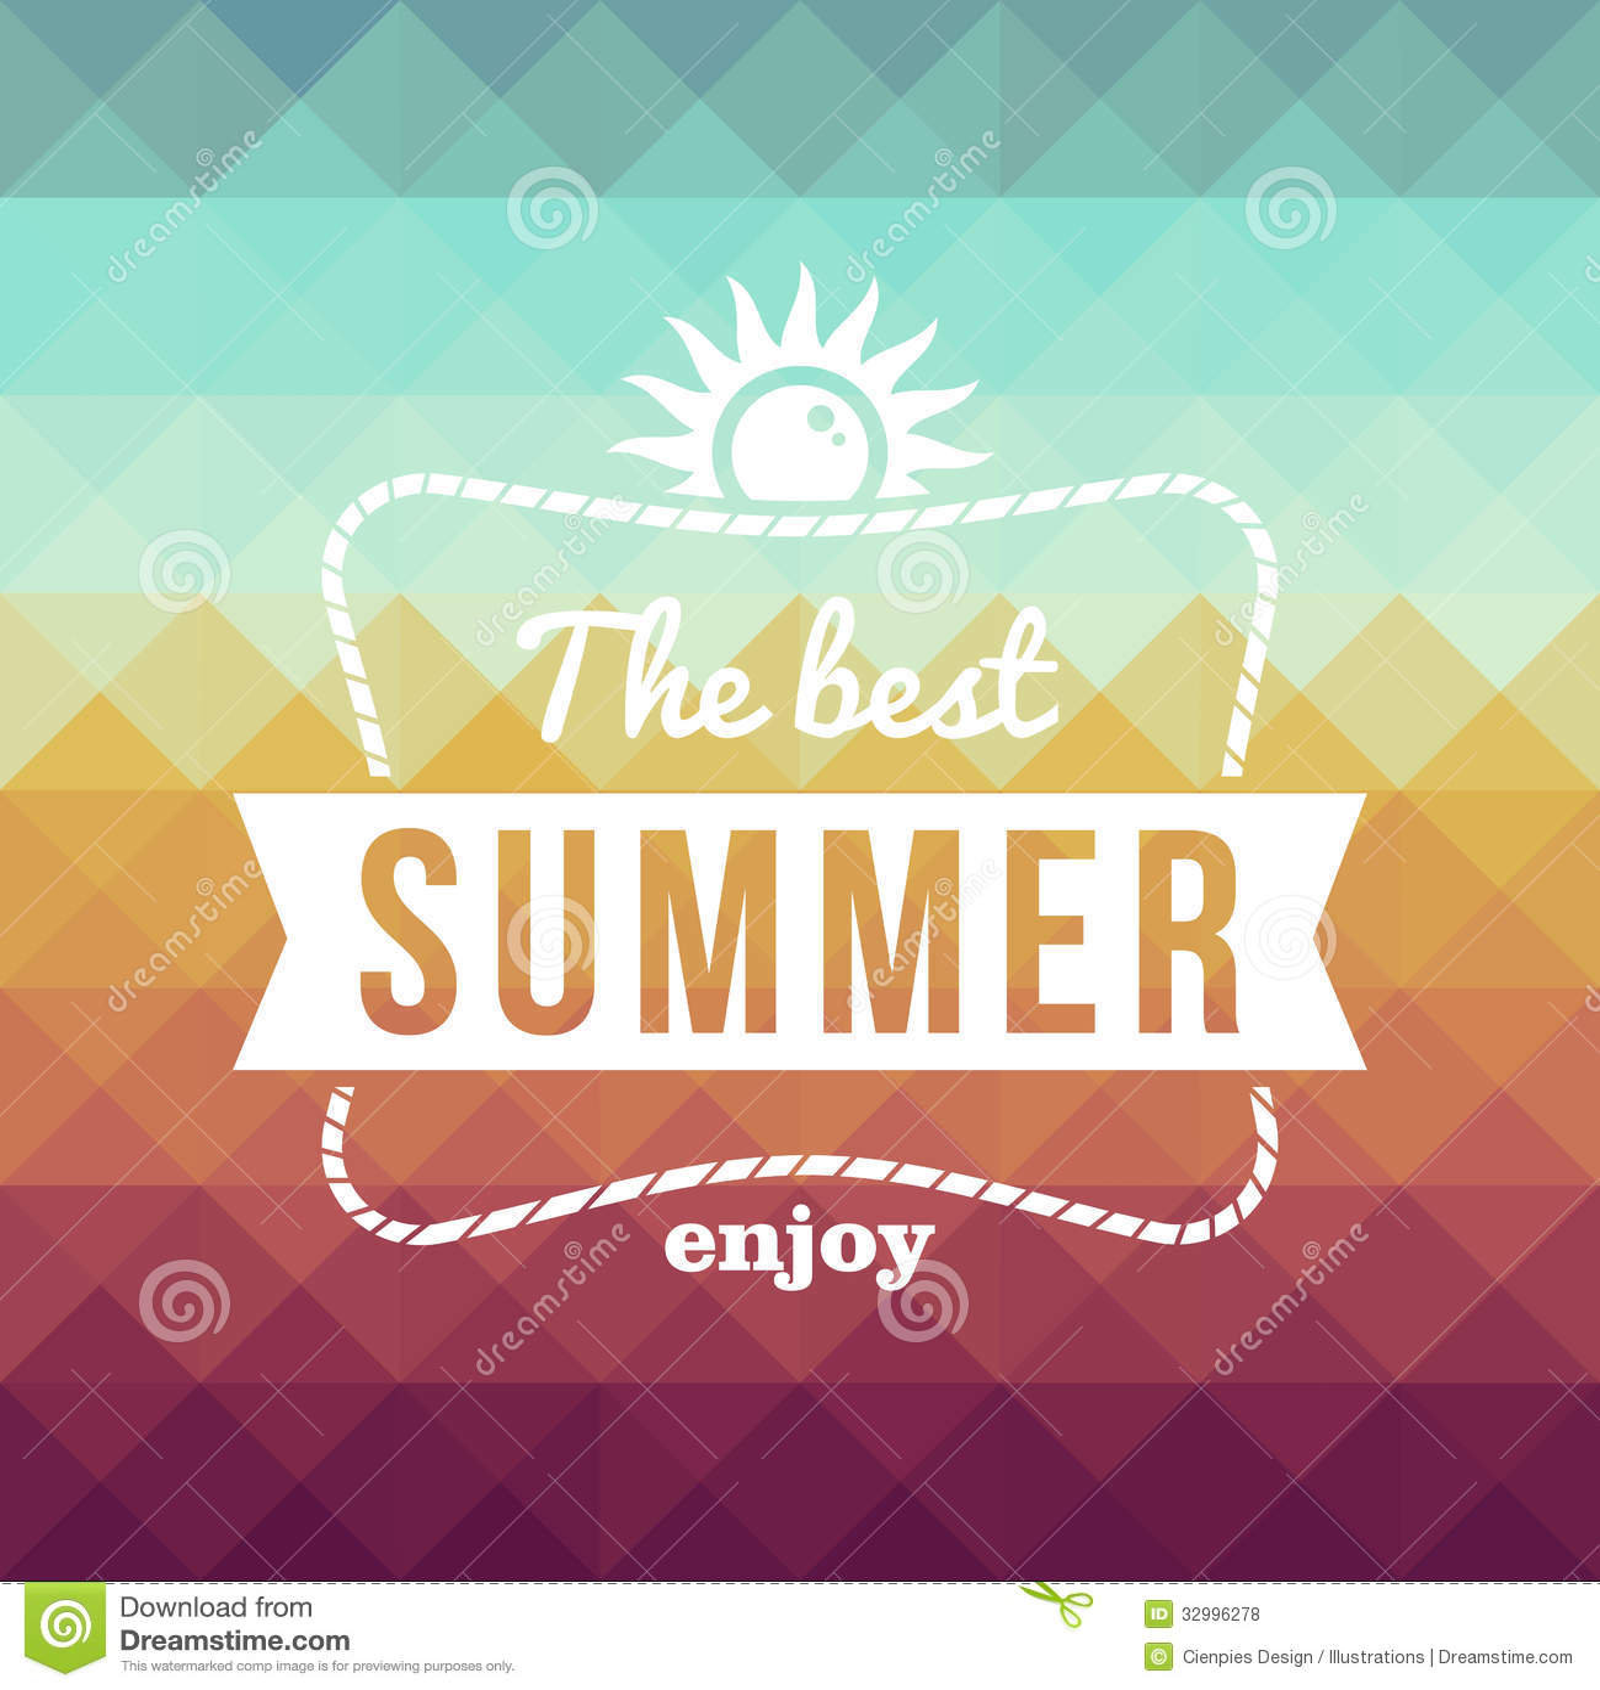 Retro Summertime Holidays Poster Stock Vector